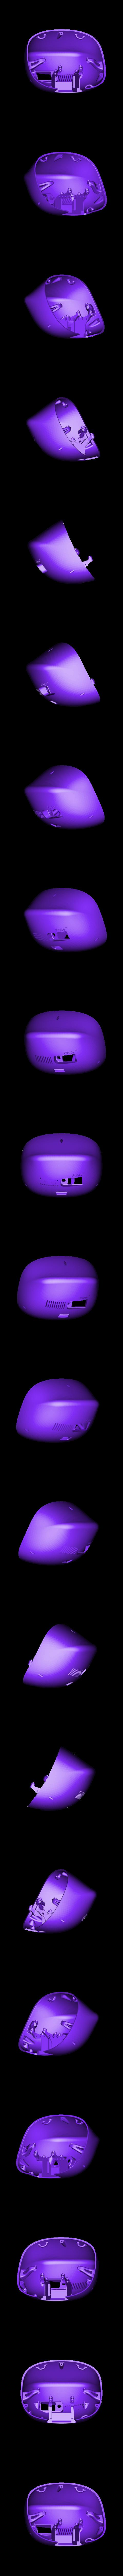 head_back.STL Download free STL file Poppy Torso • 3D printable model, PoppyProject